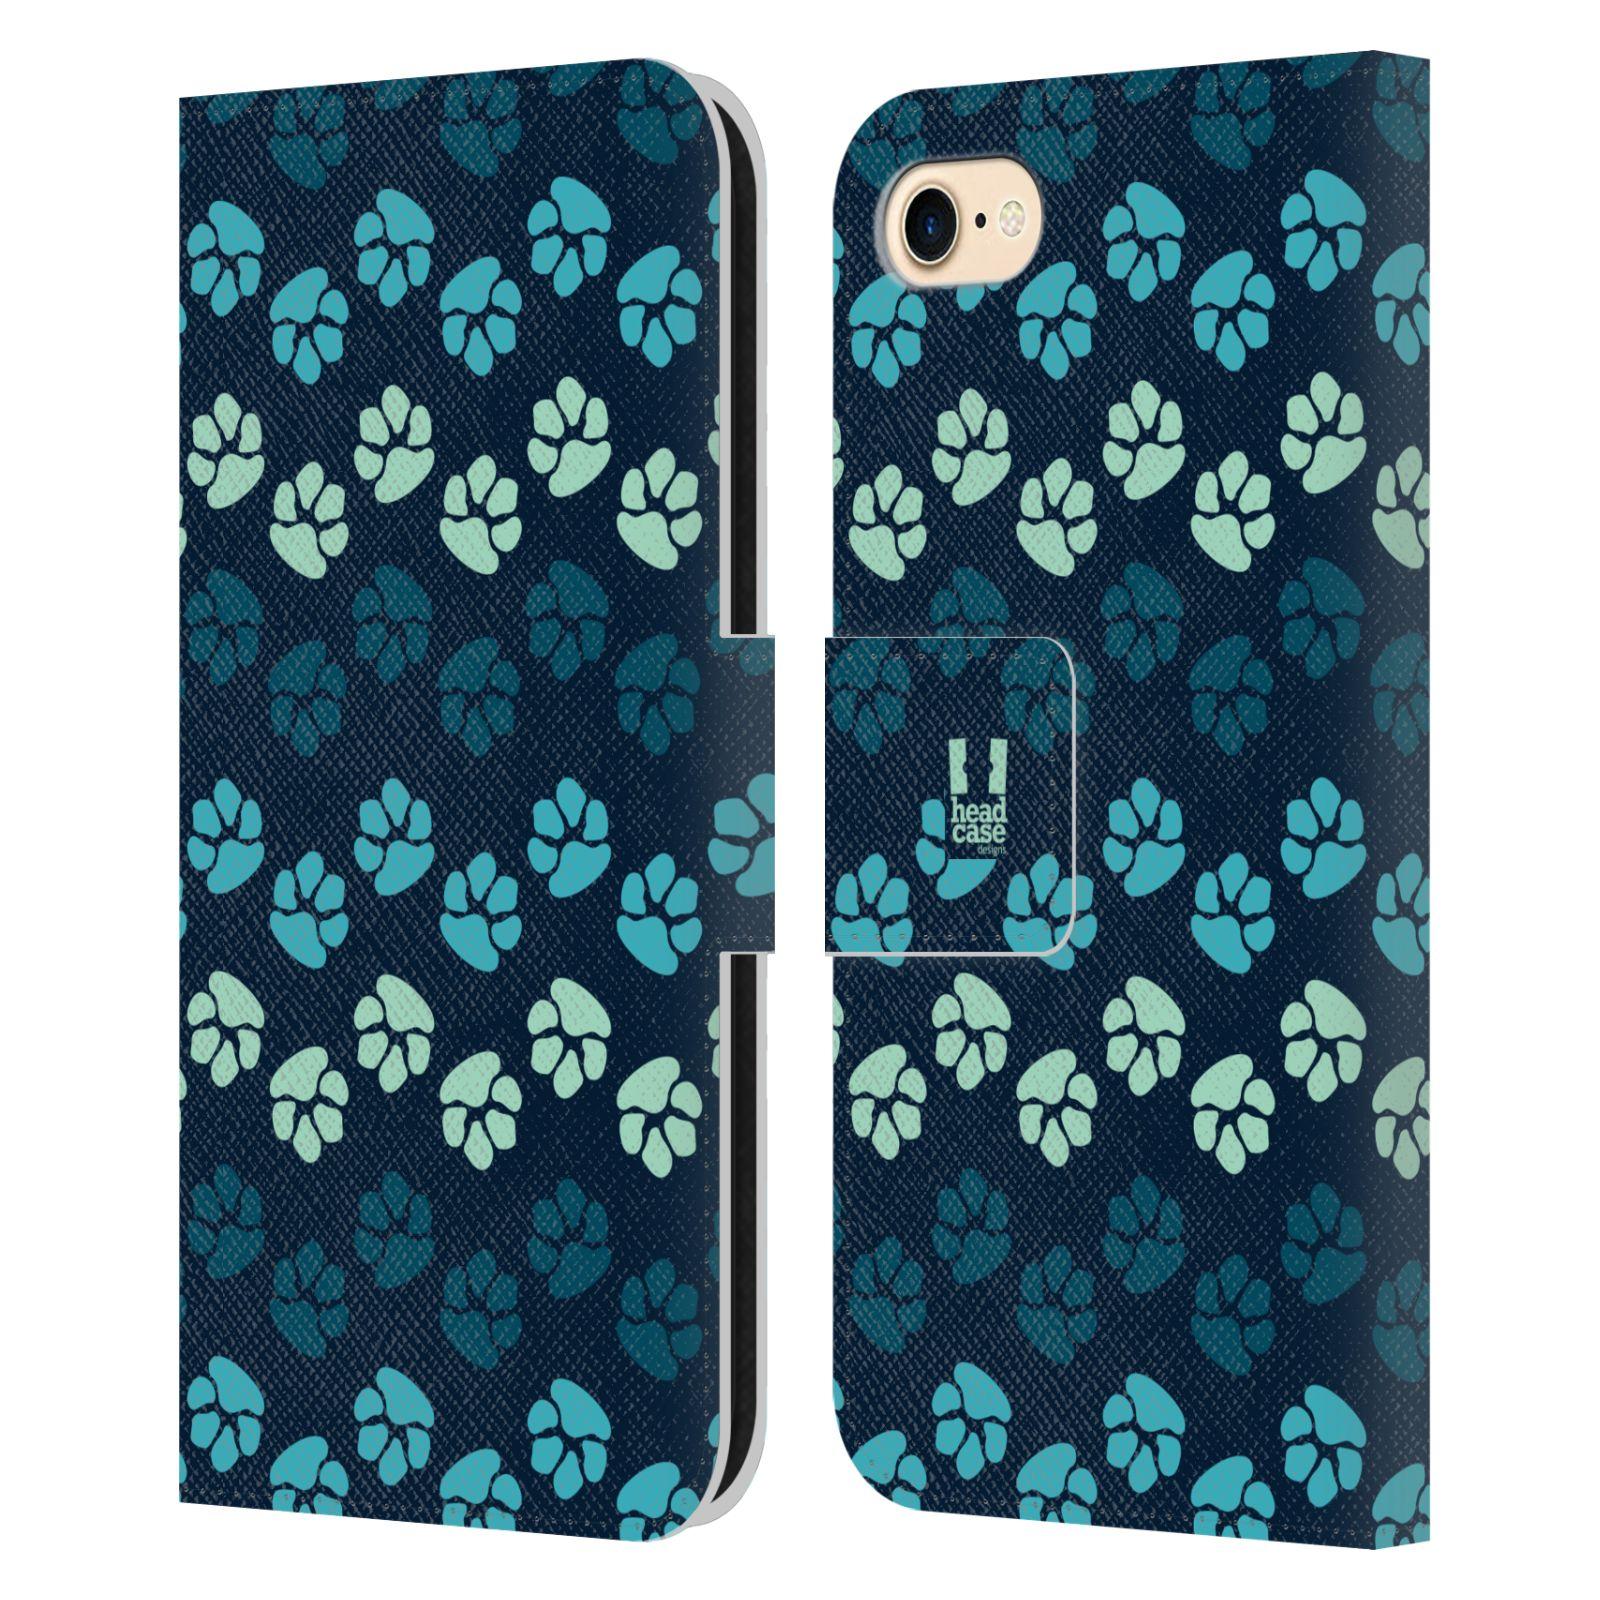 HEAD CASE Flipové pouzdro pro mobil Apple Iphone 7/8 Pejsek ťapky modrá barva